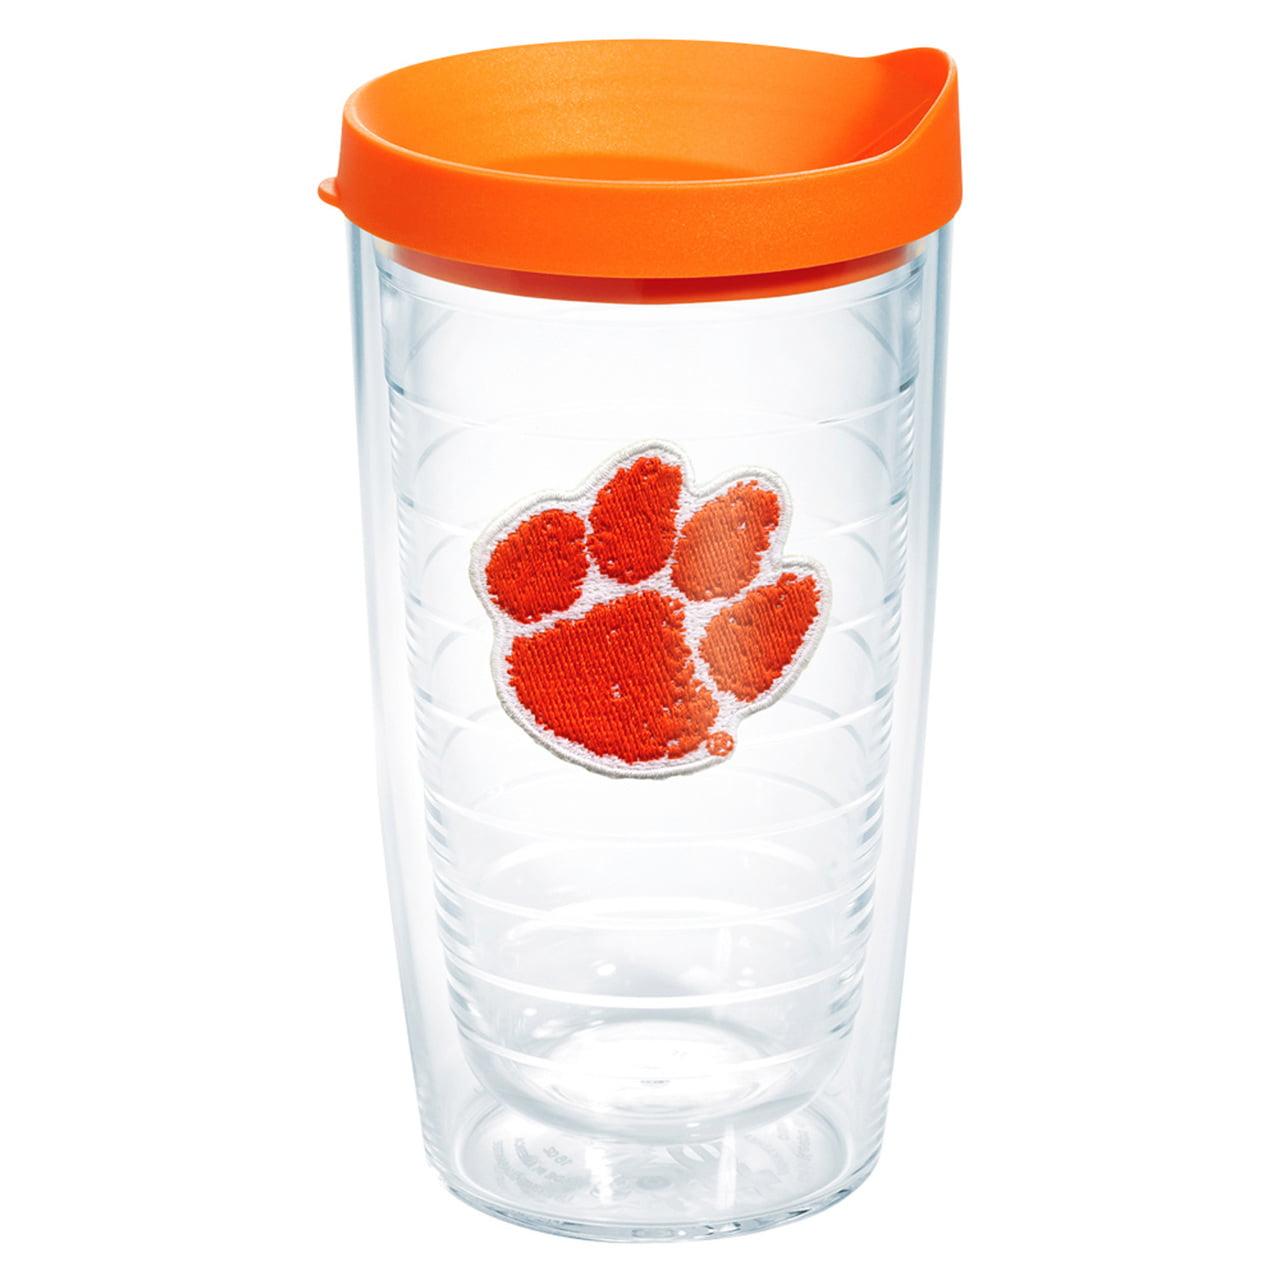 Clemson Tigers 16 oz Tumbler with Lid - Orange